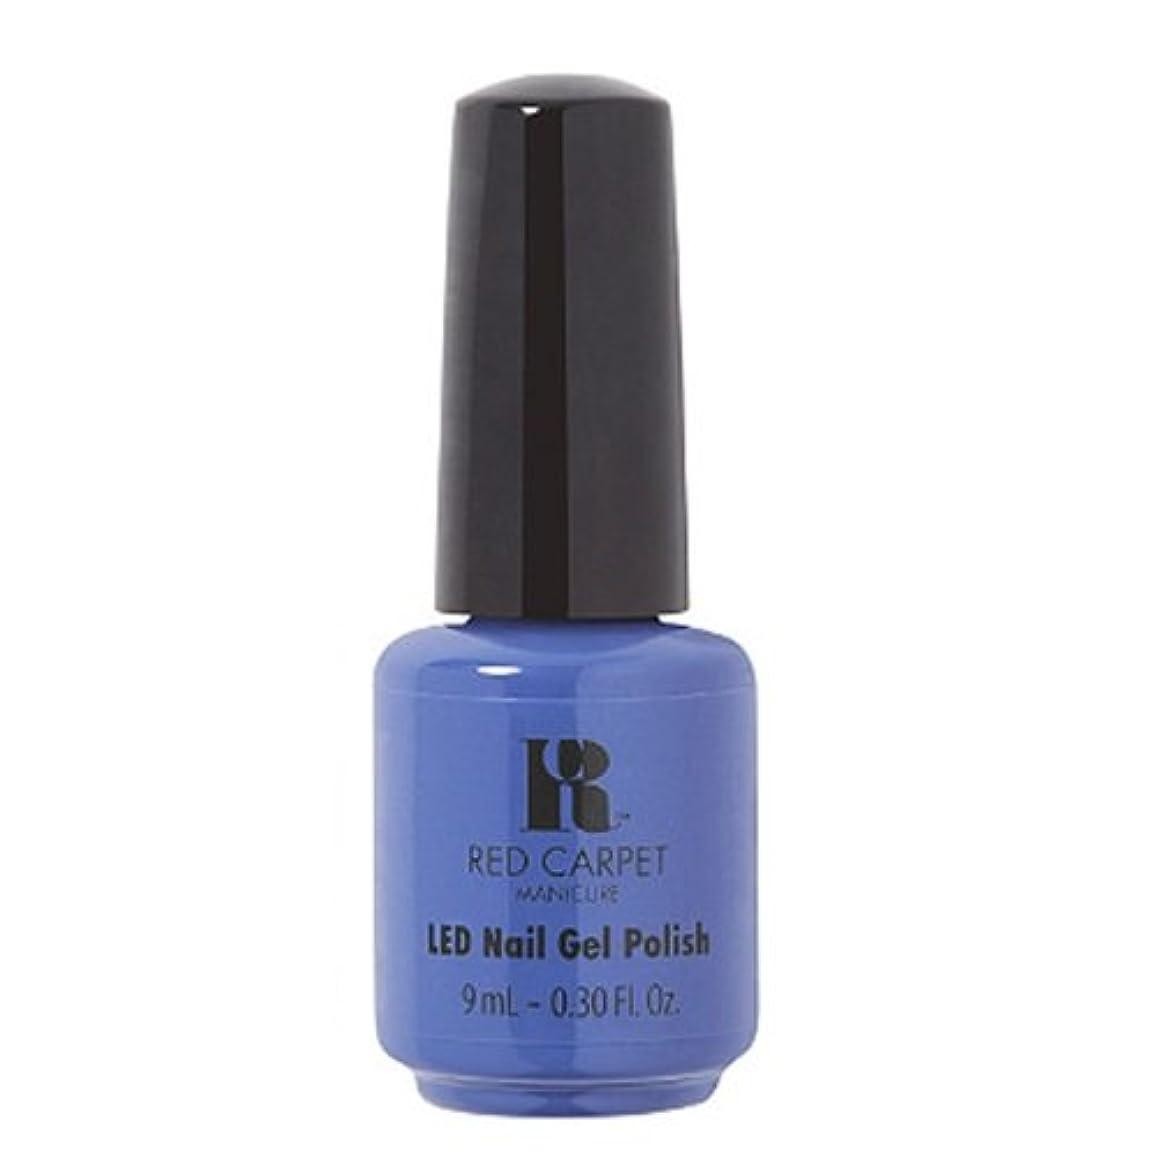 Red Carpet Manicure - LED Nail Gel Polish - Show Biz Beauty - 0.3oz / 9ml